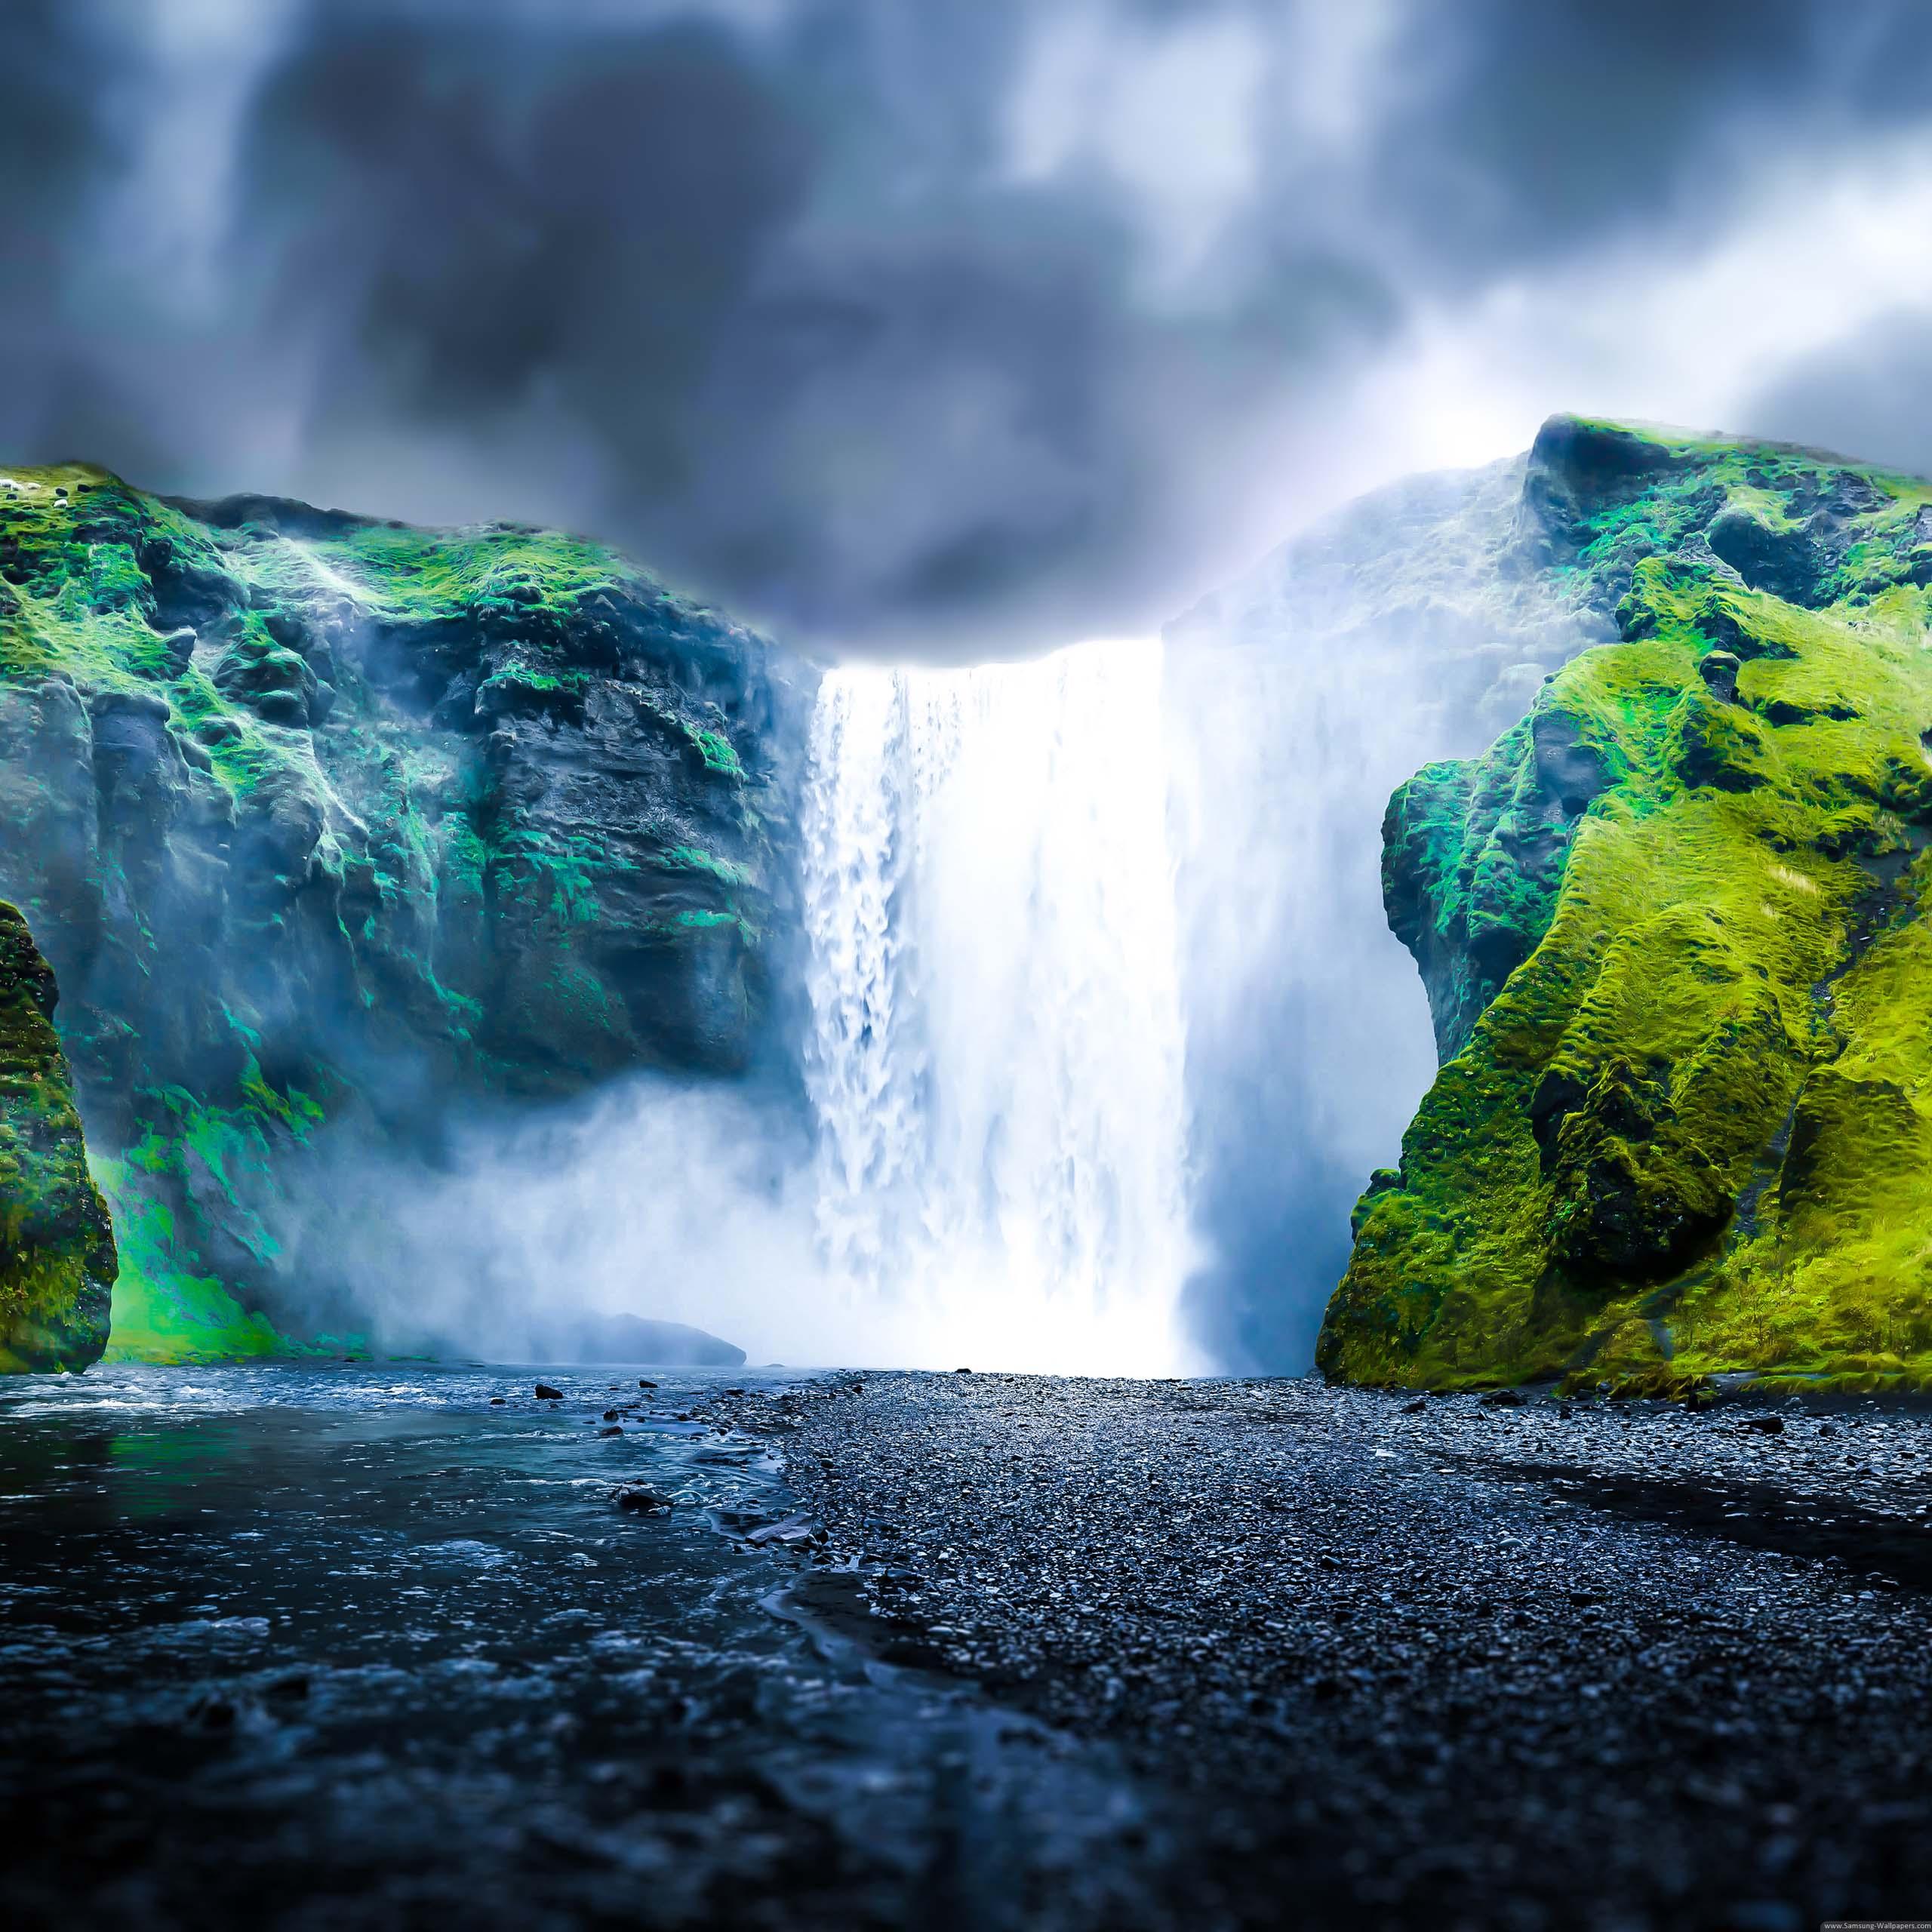 Iphone 5s Wallpaper: صور خلفيات مناظر طبيعية من العالم اتش دي